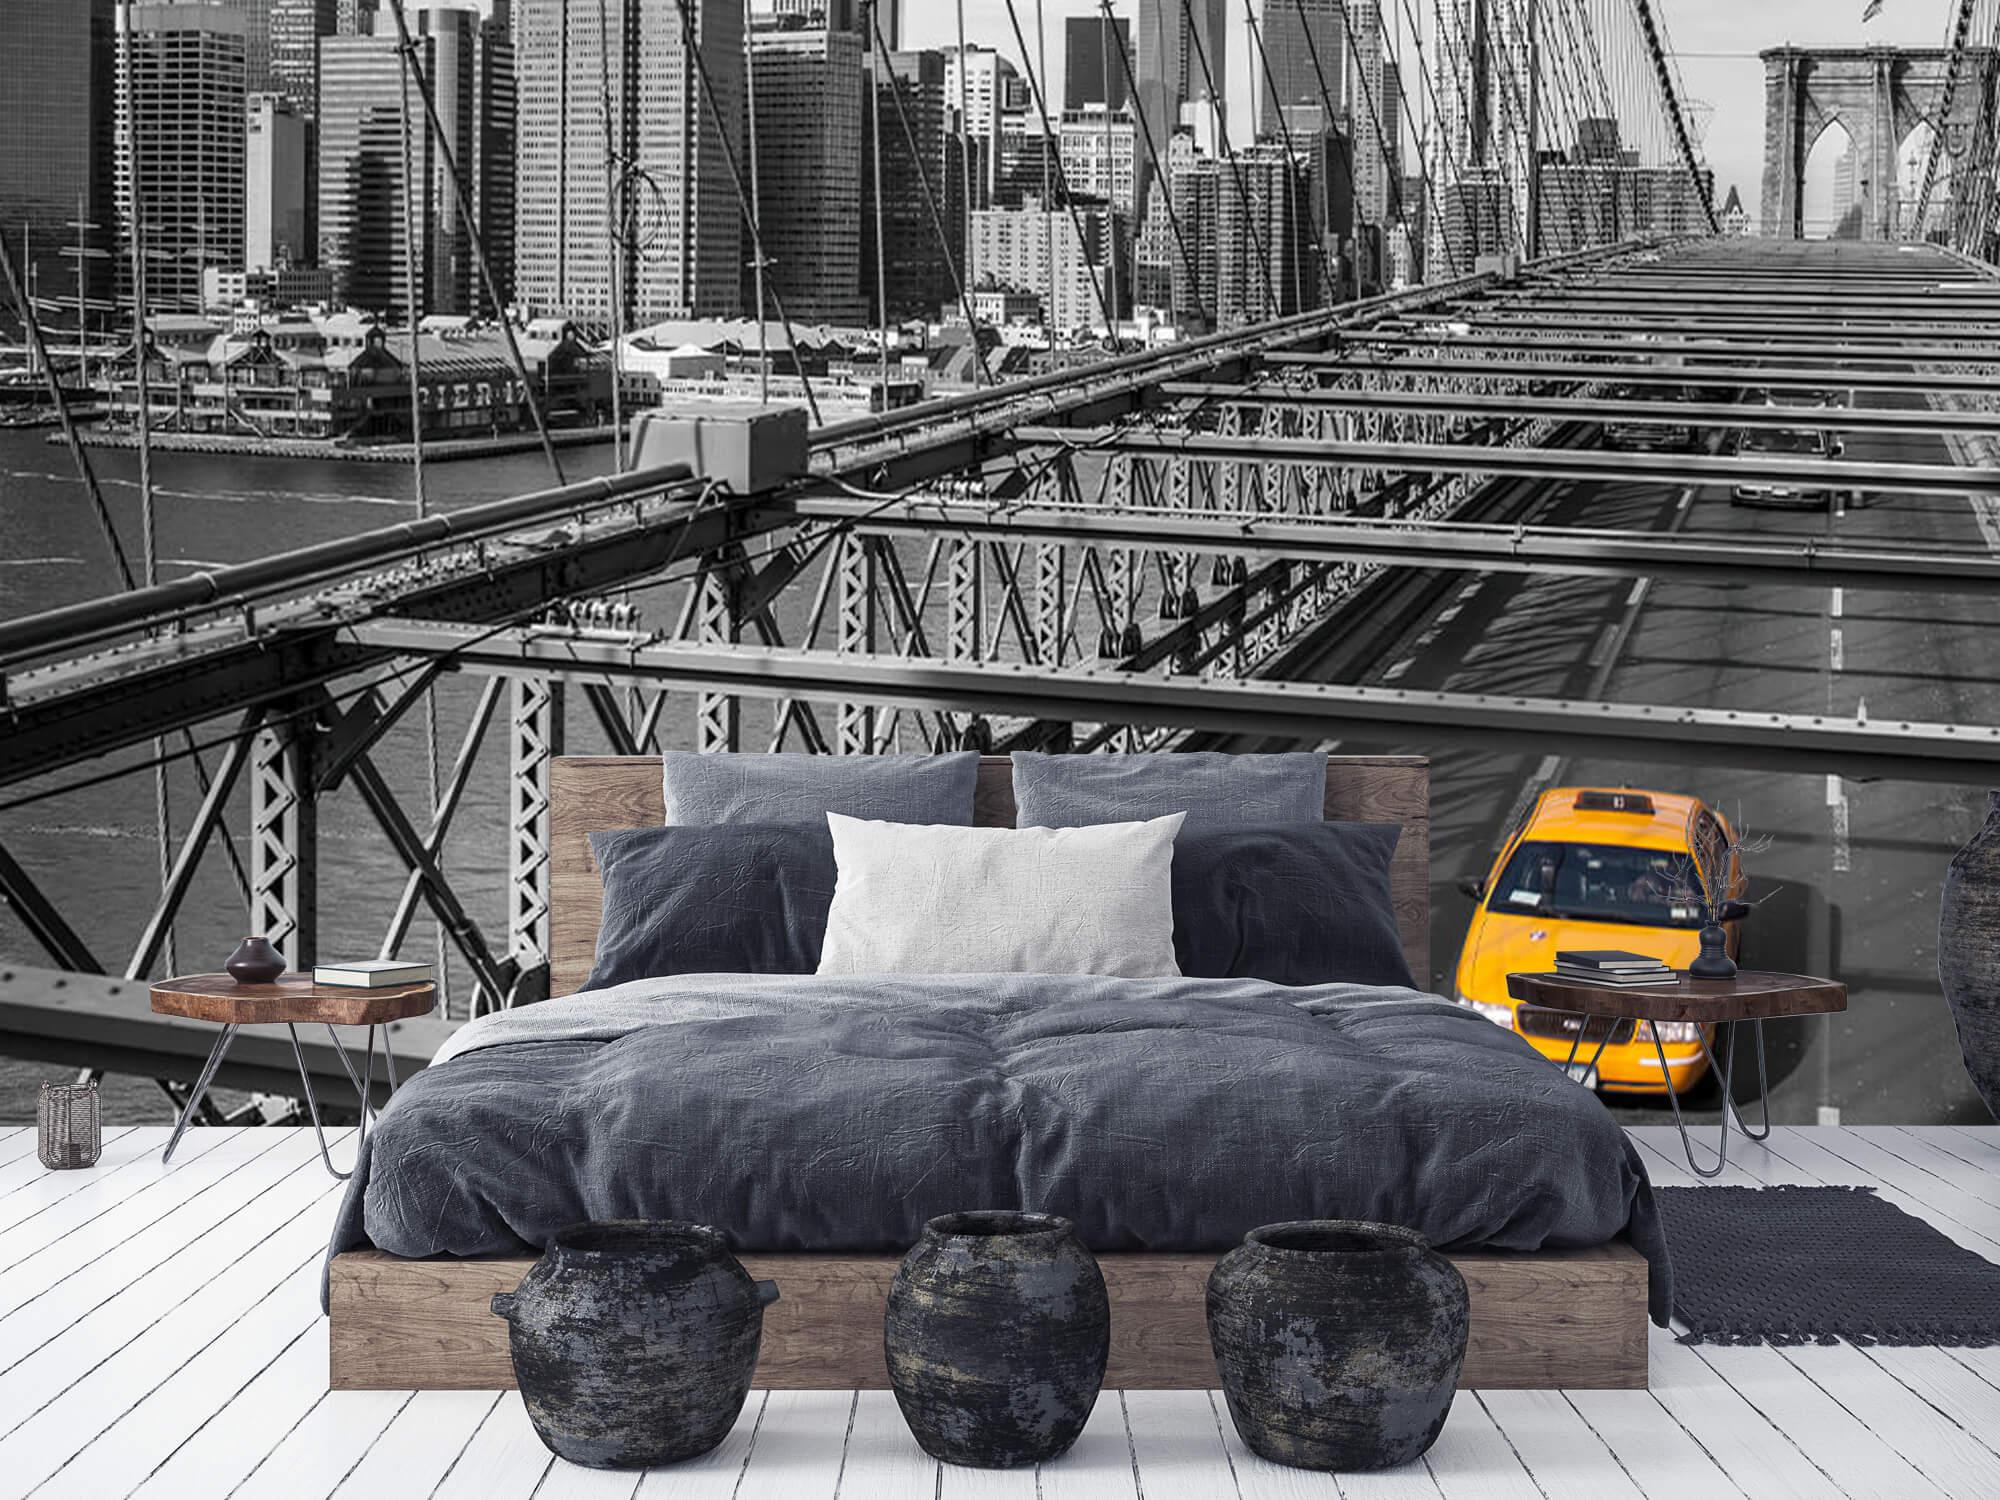 A taxi across the Brooklyn Bridge 9